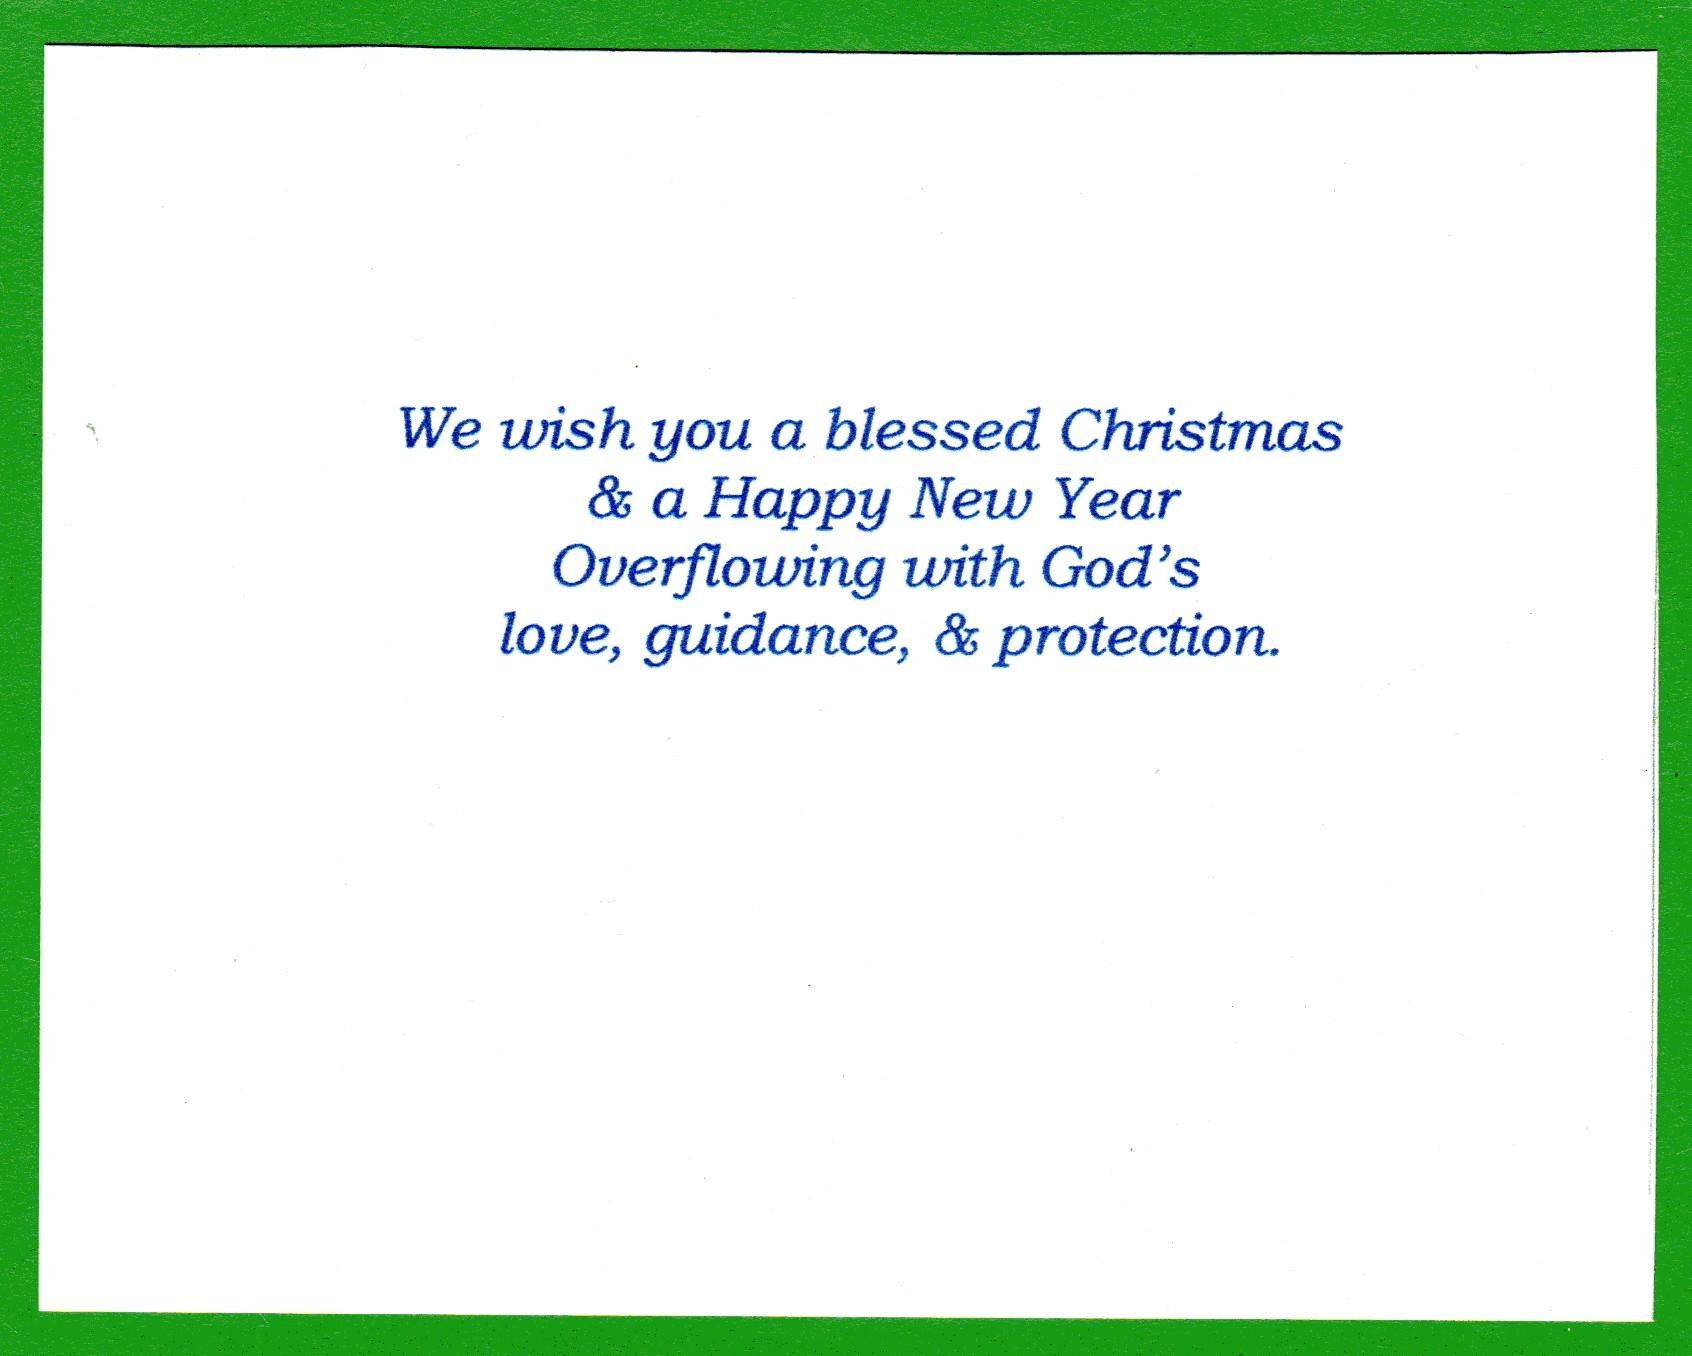 organization greeting card